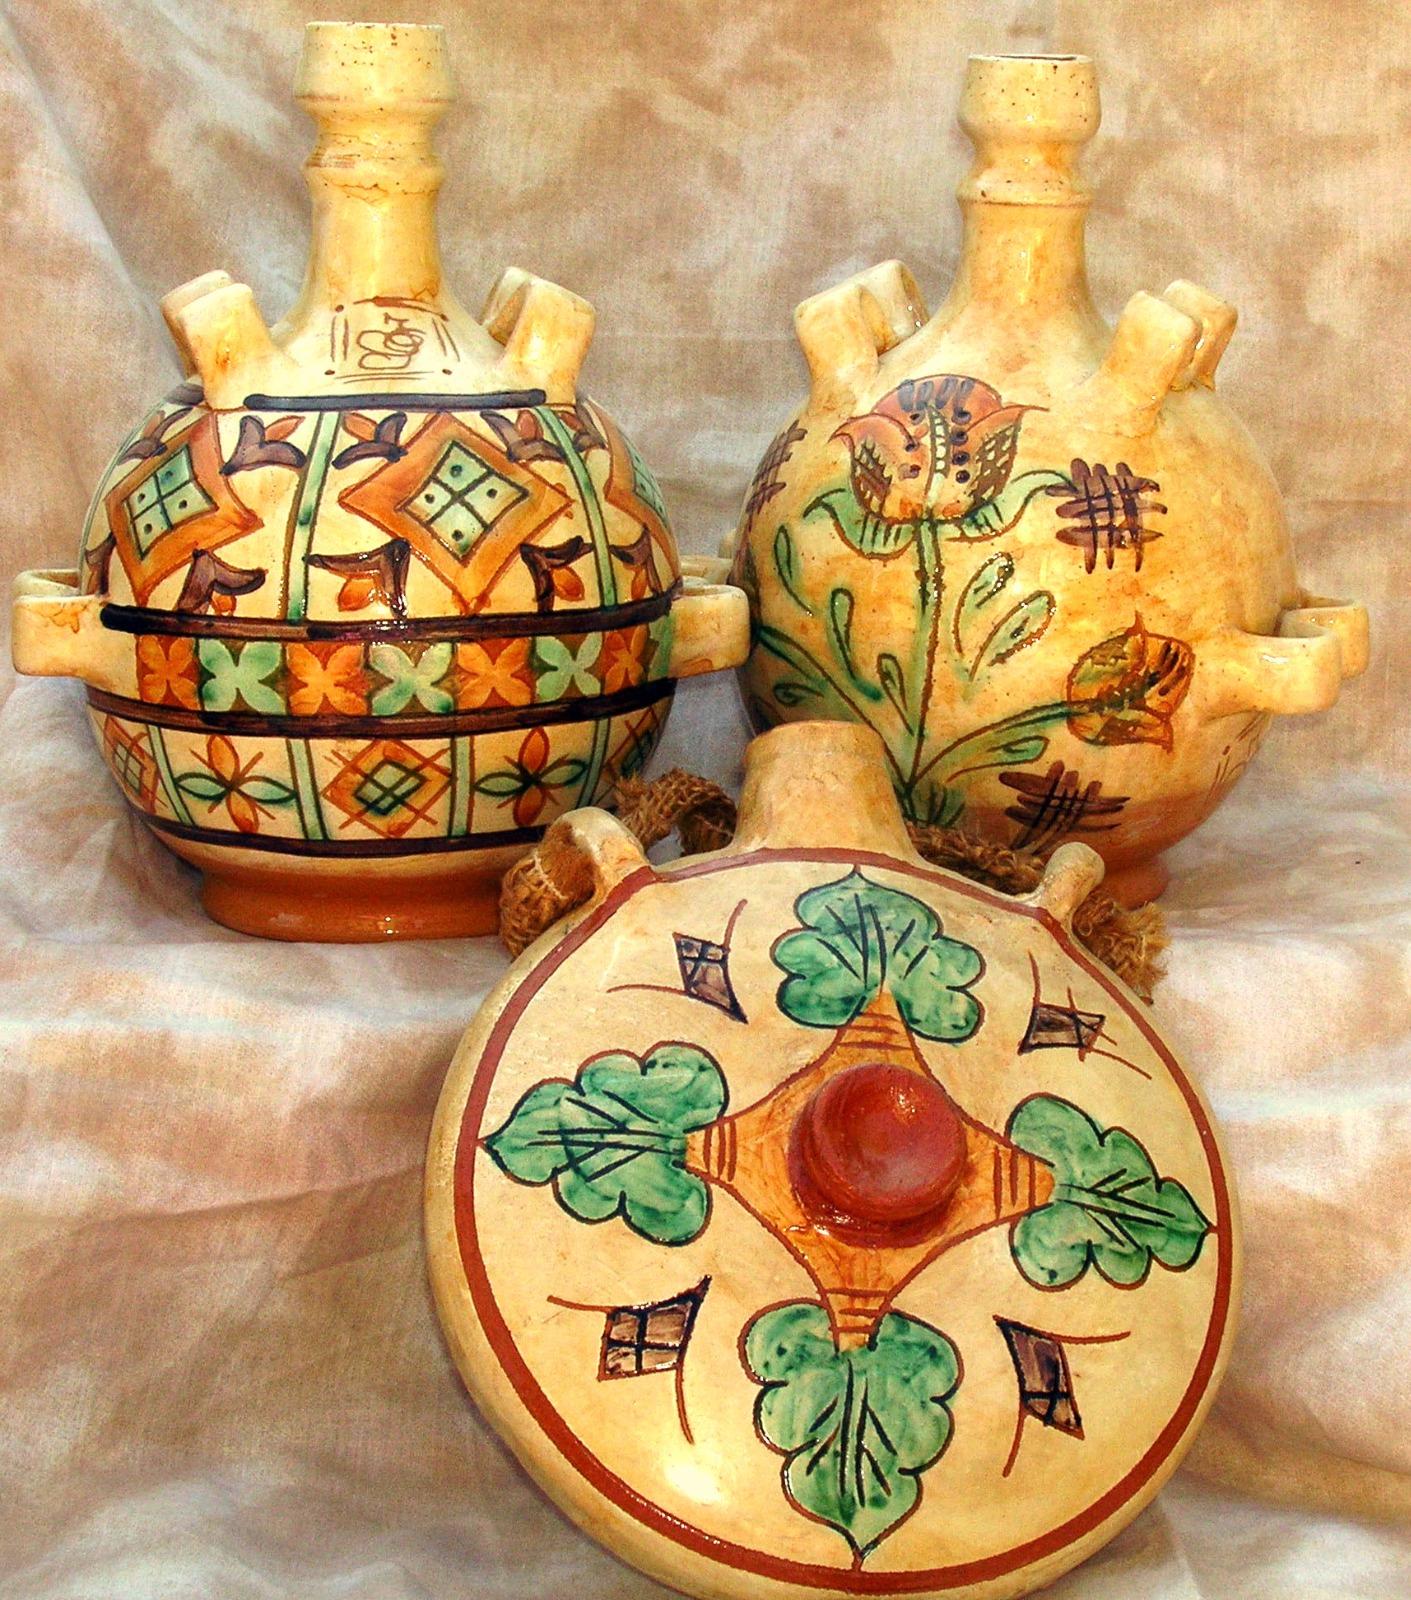 Metodi di datazione per ceramiche